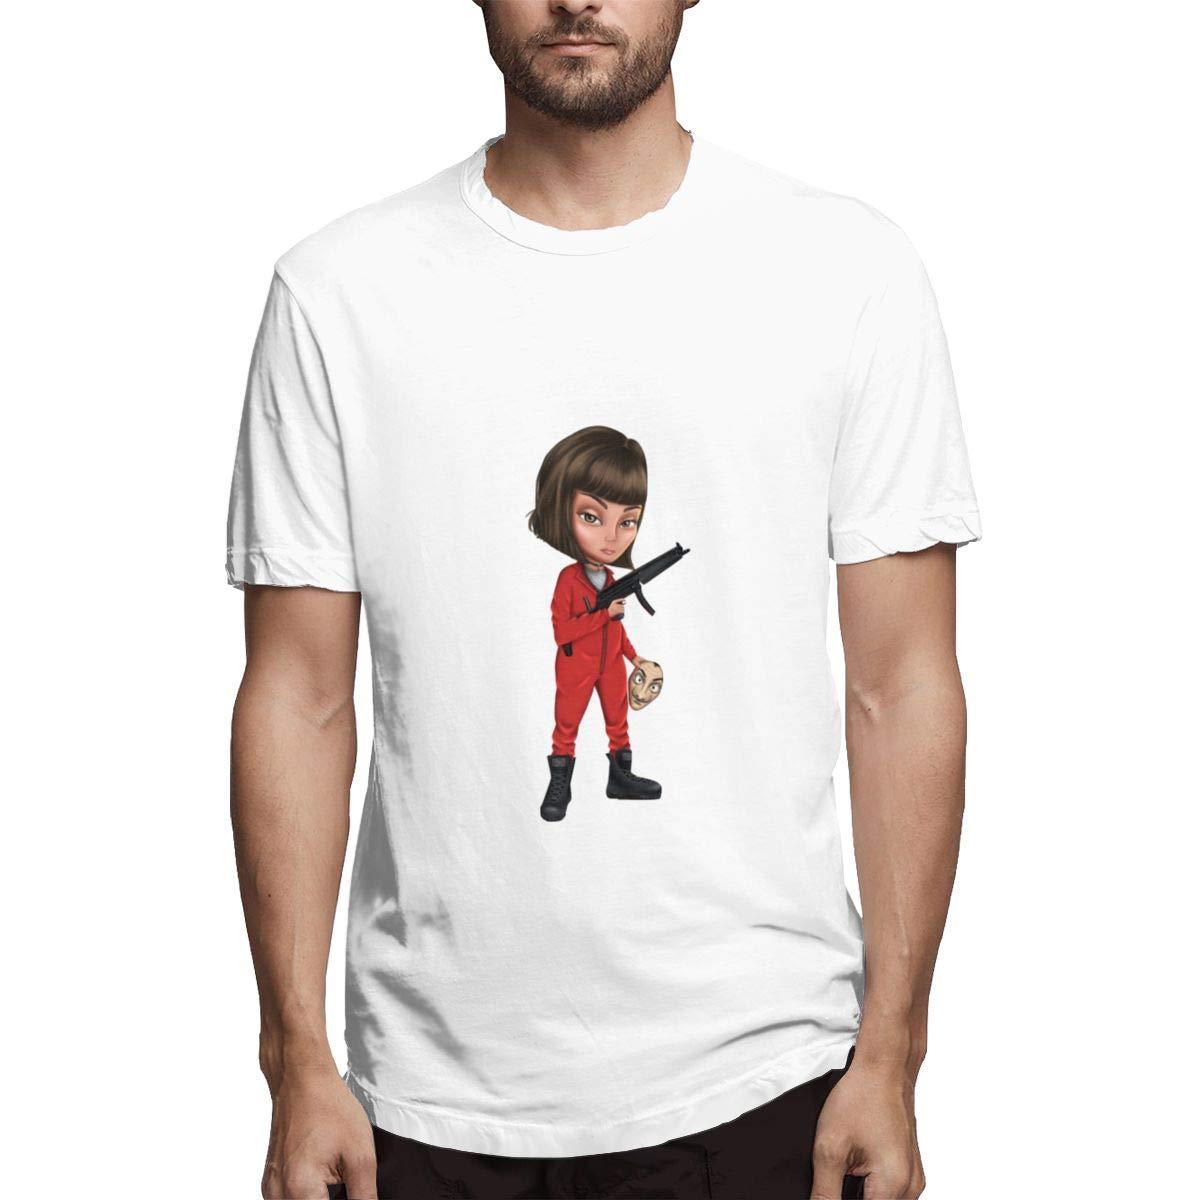 QINSHAONI La-Casa-de-Papel Teenagers Boy Retro Fashion Printed Letters Cartoon Pattern Comfortable Light T-Shirt Tee 6XL